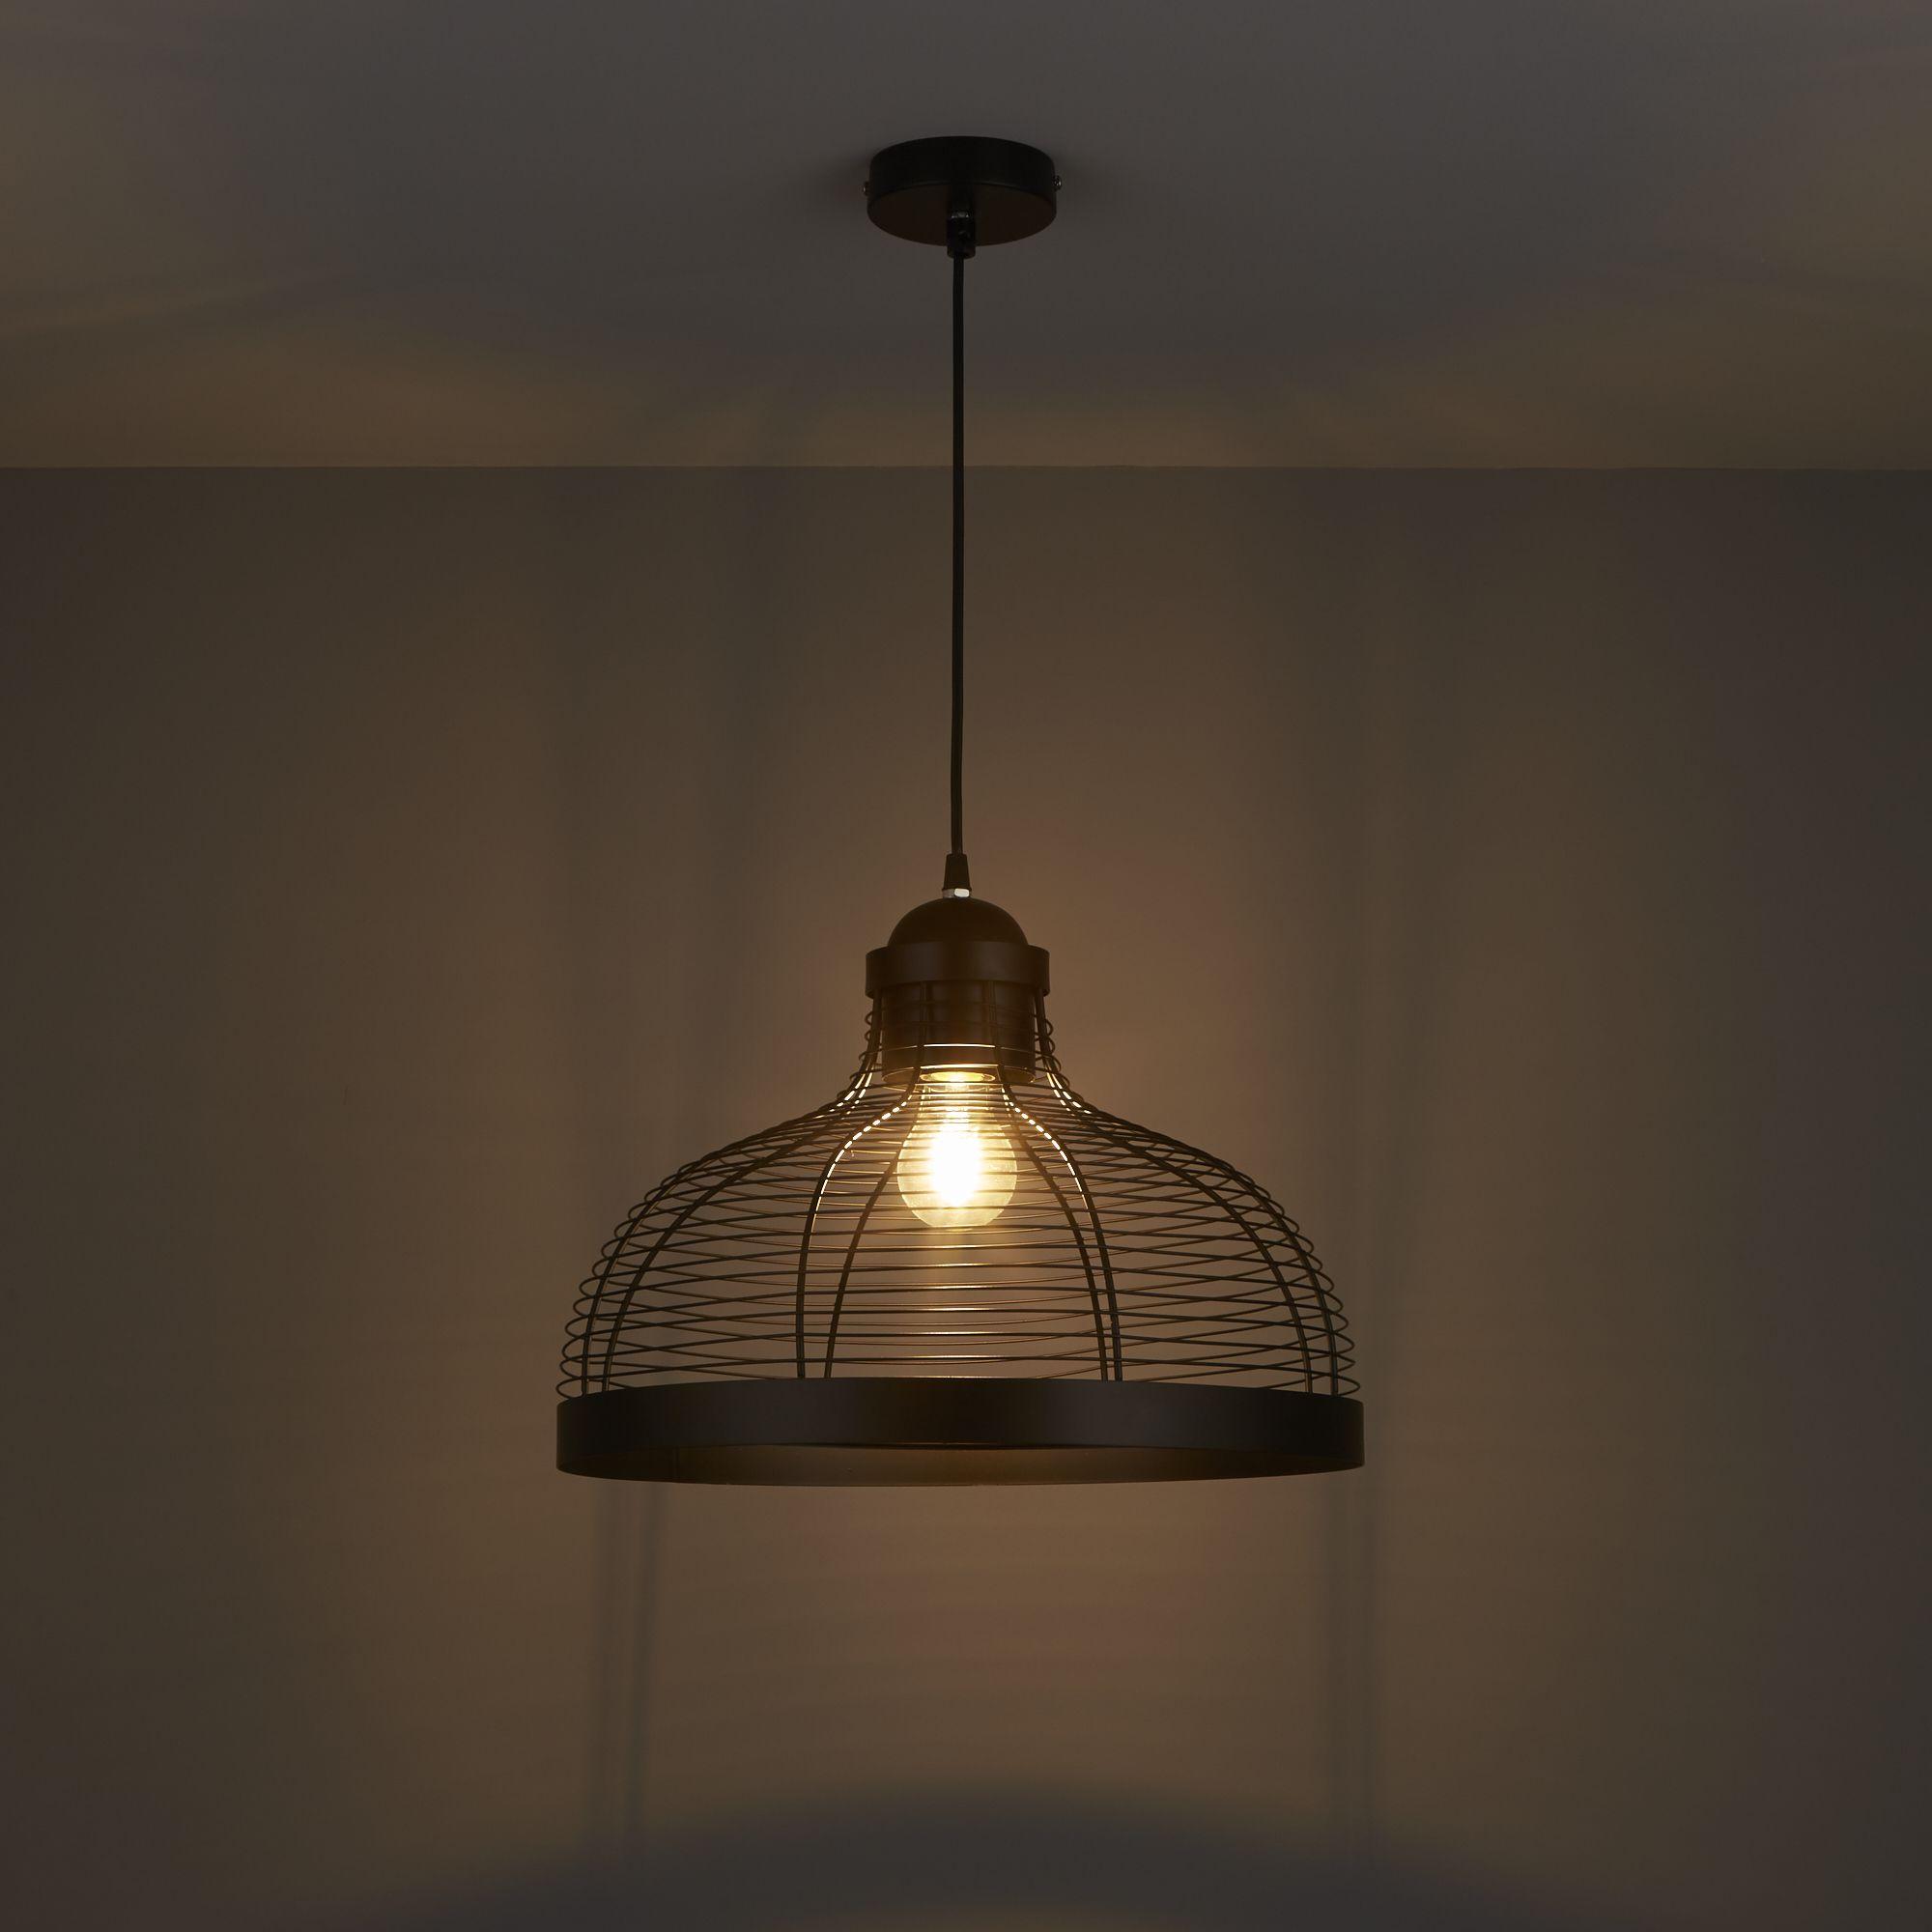 Baici Matt Black Pendant Ceiling Light Departments Diy At B Q